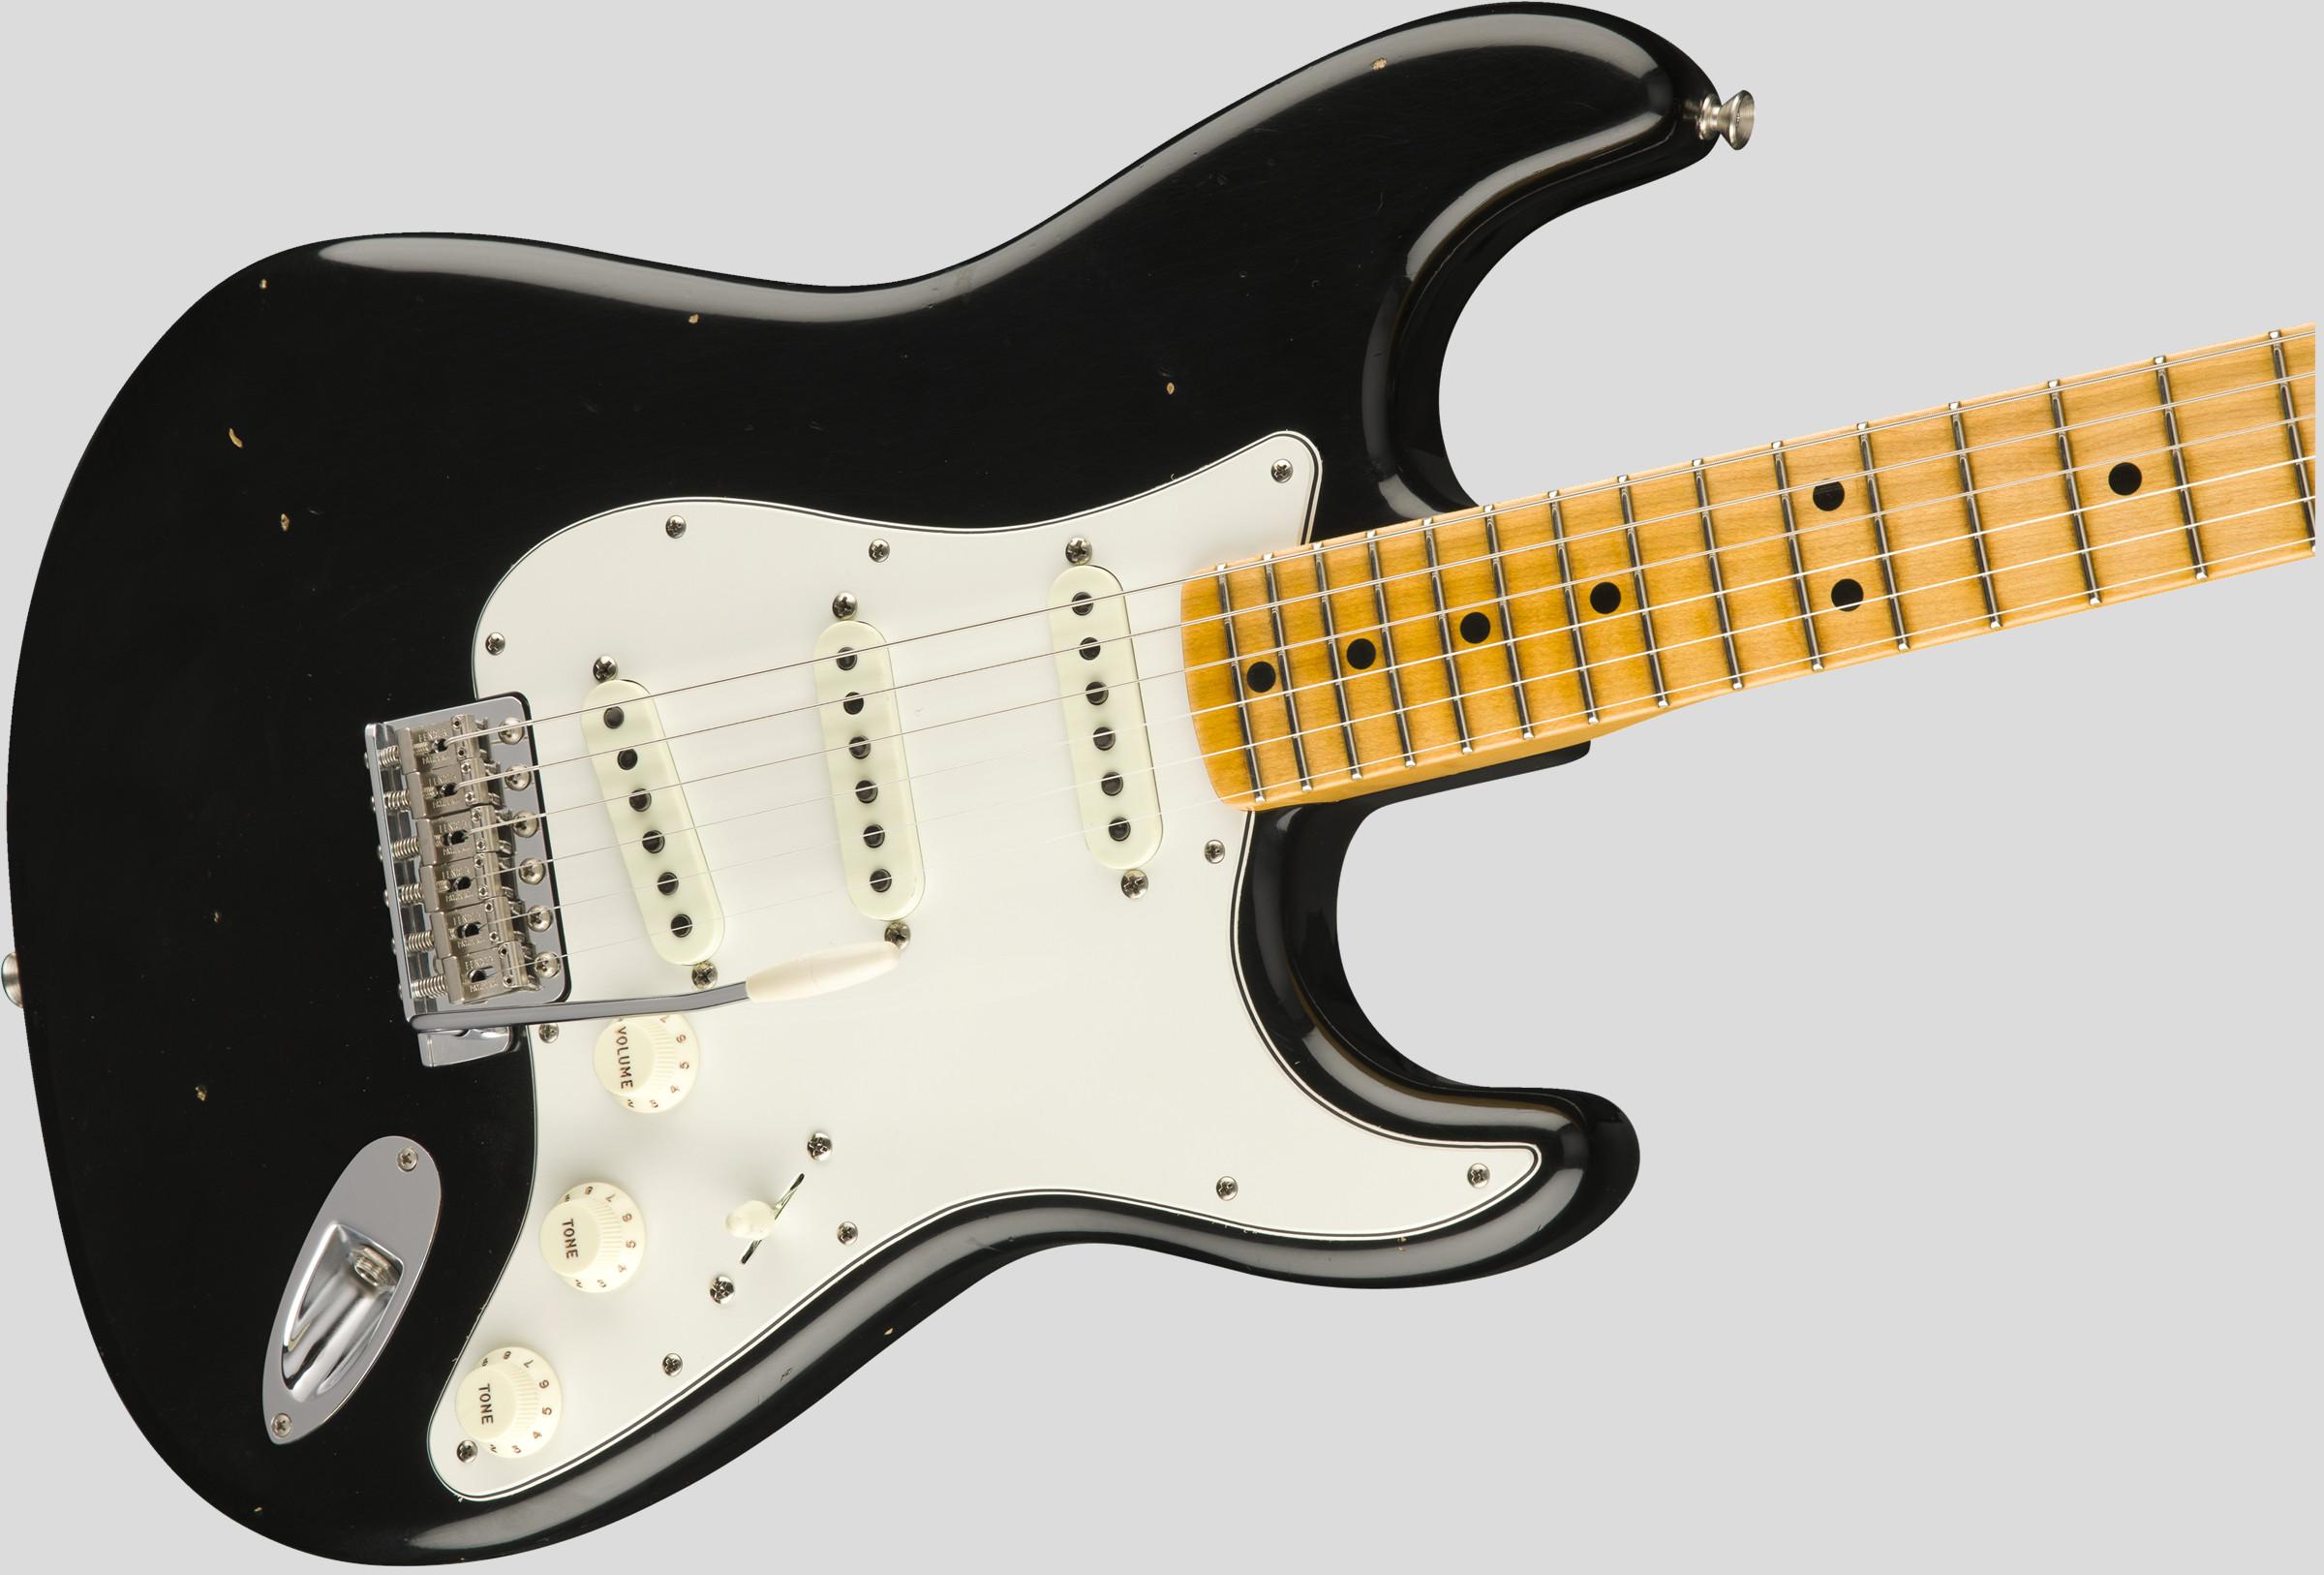 Fender Custom Shop Jimi Hendrix Voodoo Child Stratocaster Black Journeyman Relic 4